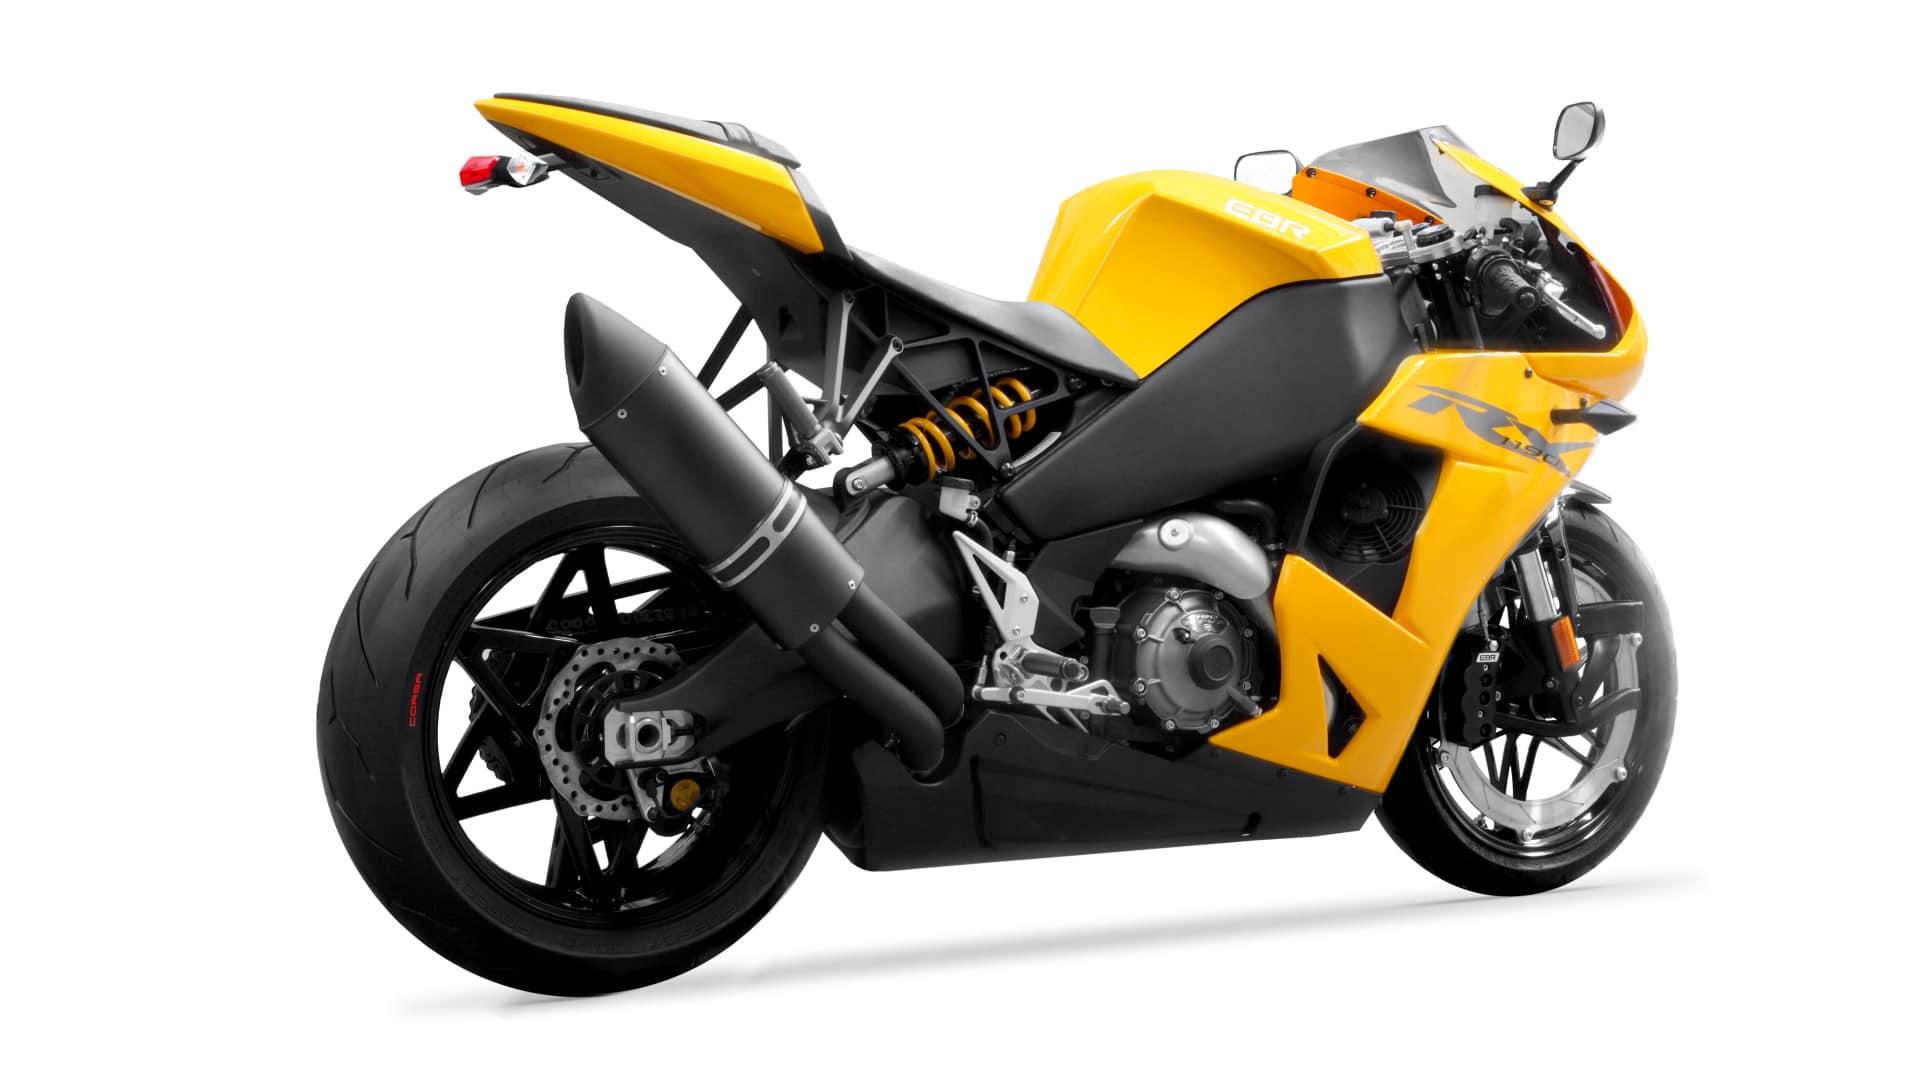 2016 model EBR 1190RX in yellow colour scheme